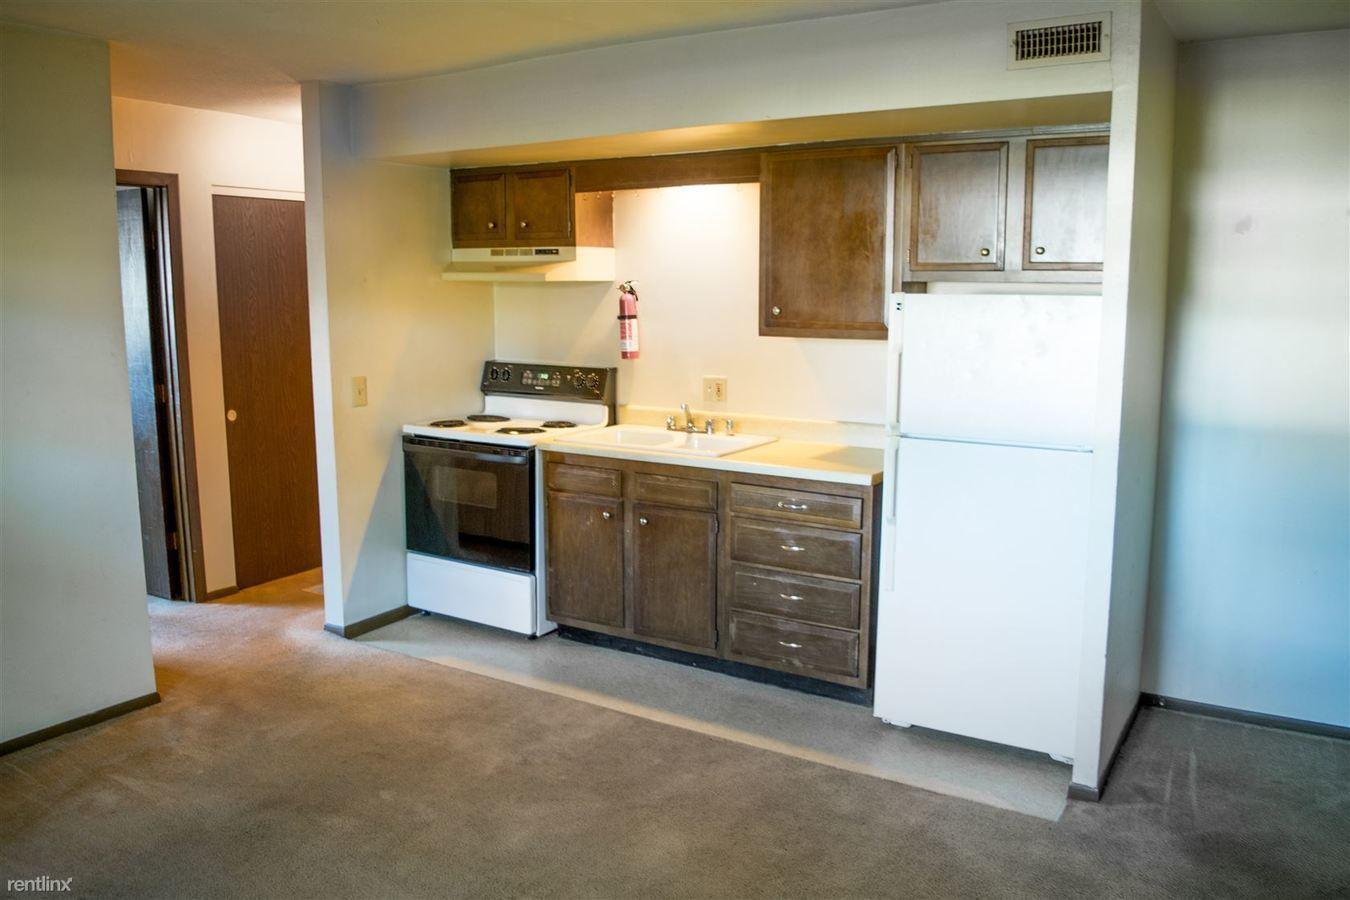 1 Bedroom 1 Bathroom Apartment for rent at Hidden Village Apartments in Toledo, OH